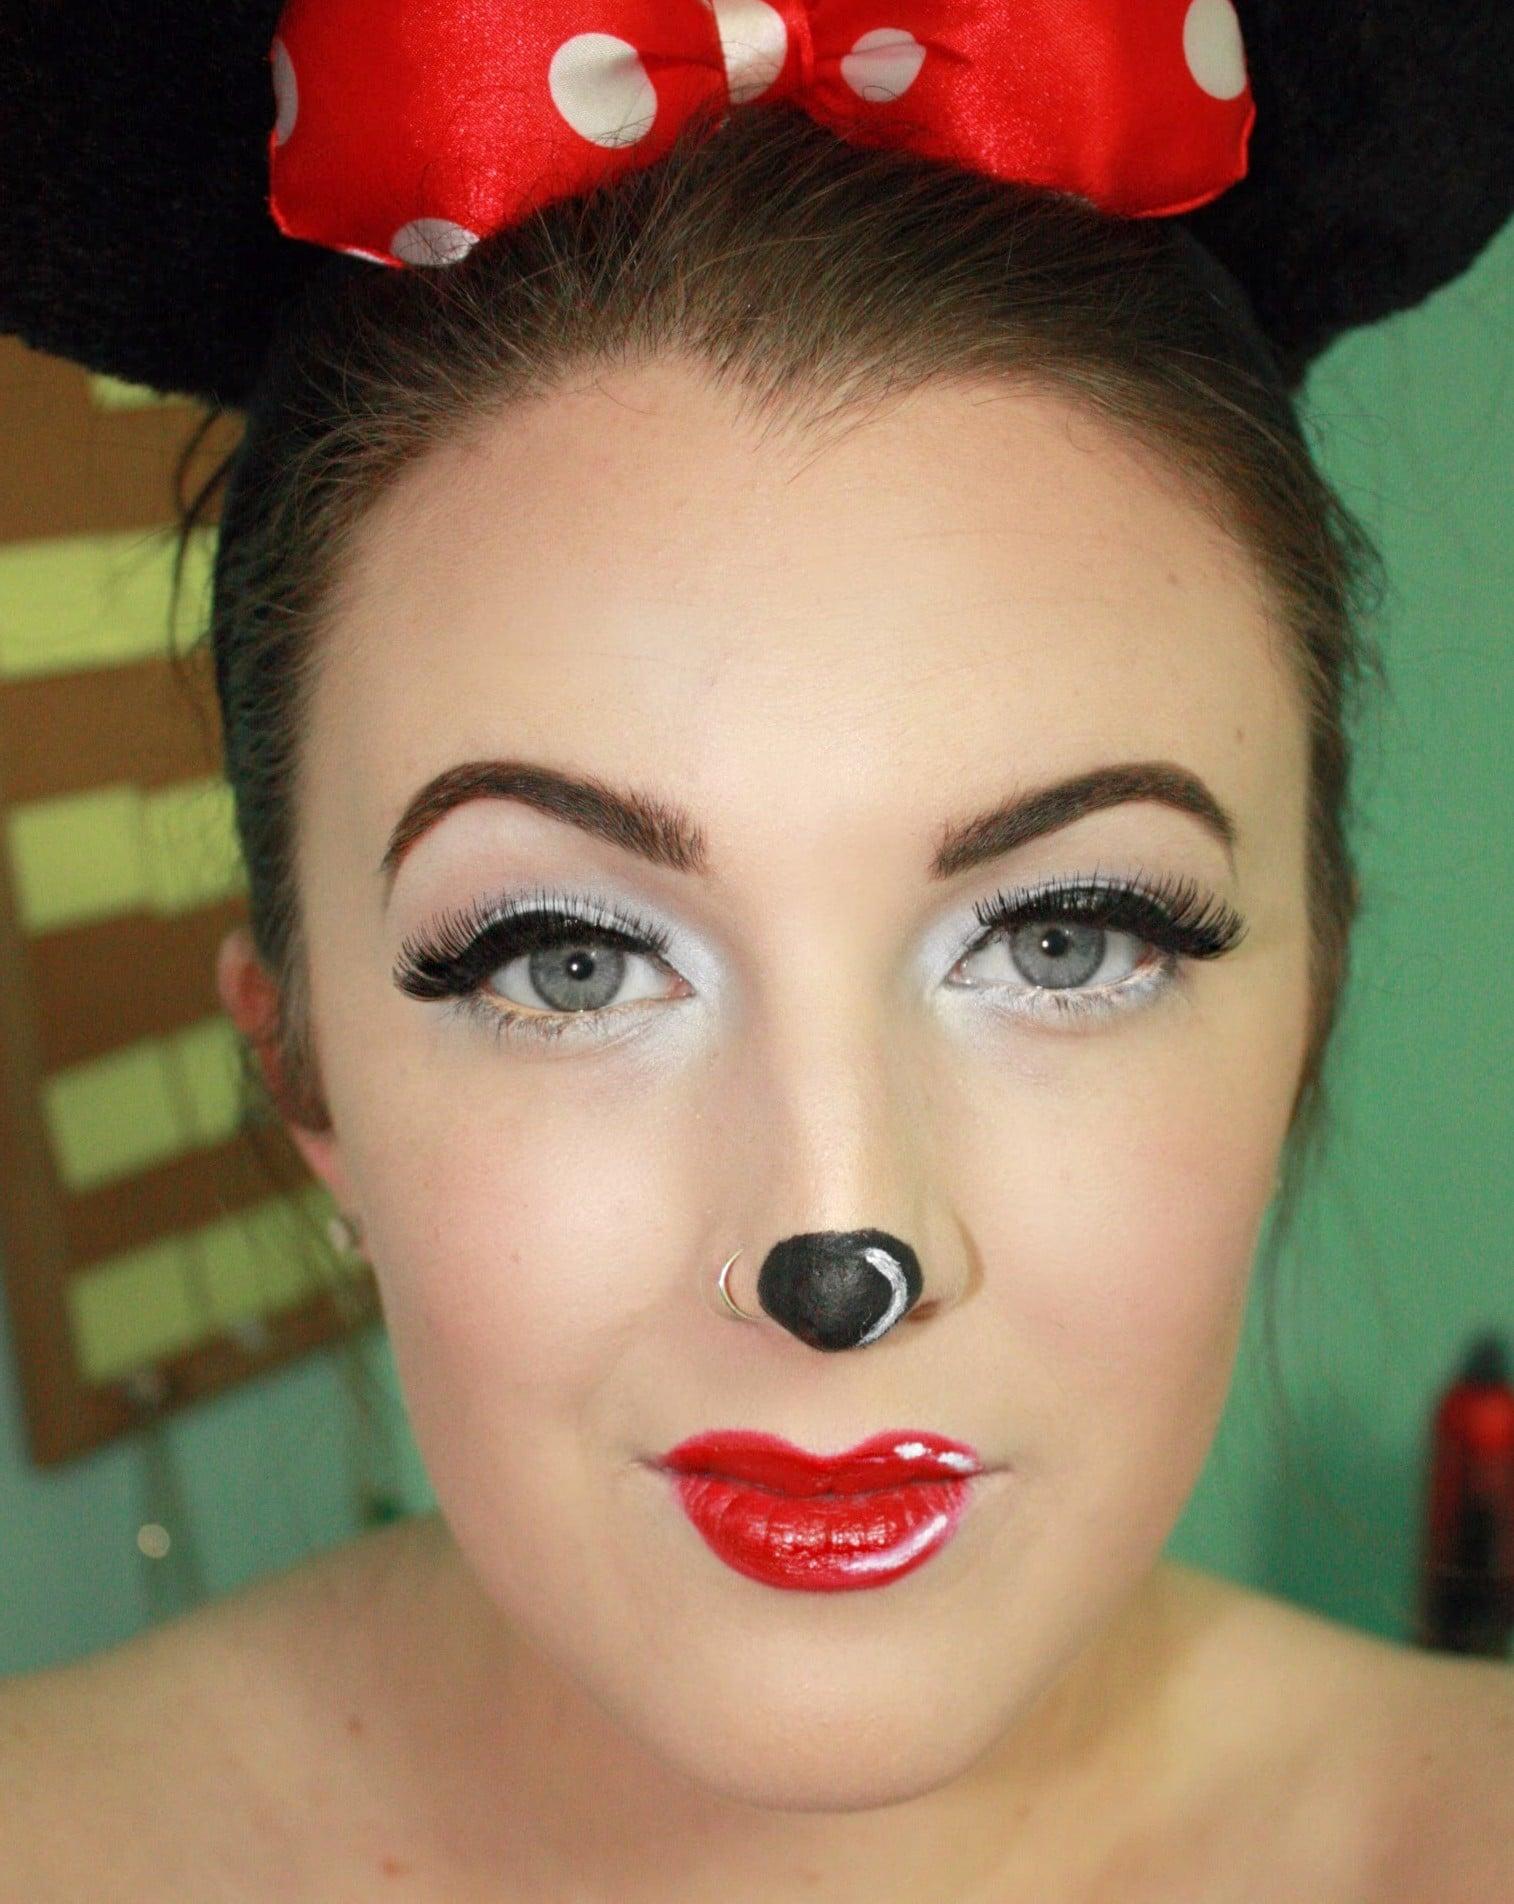 Minnie Mouse Makeup Idea Image